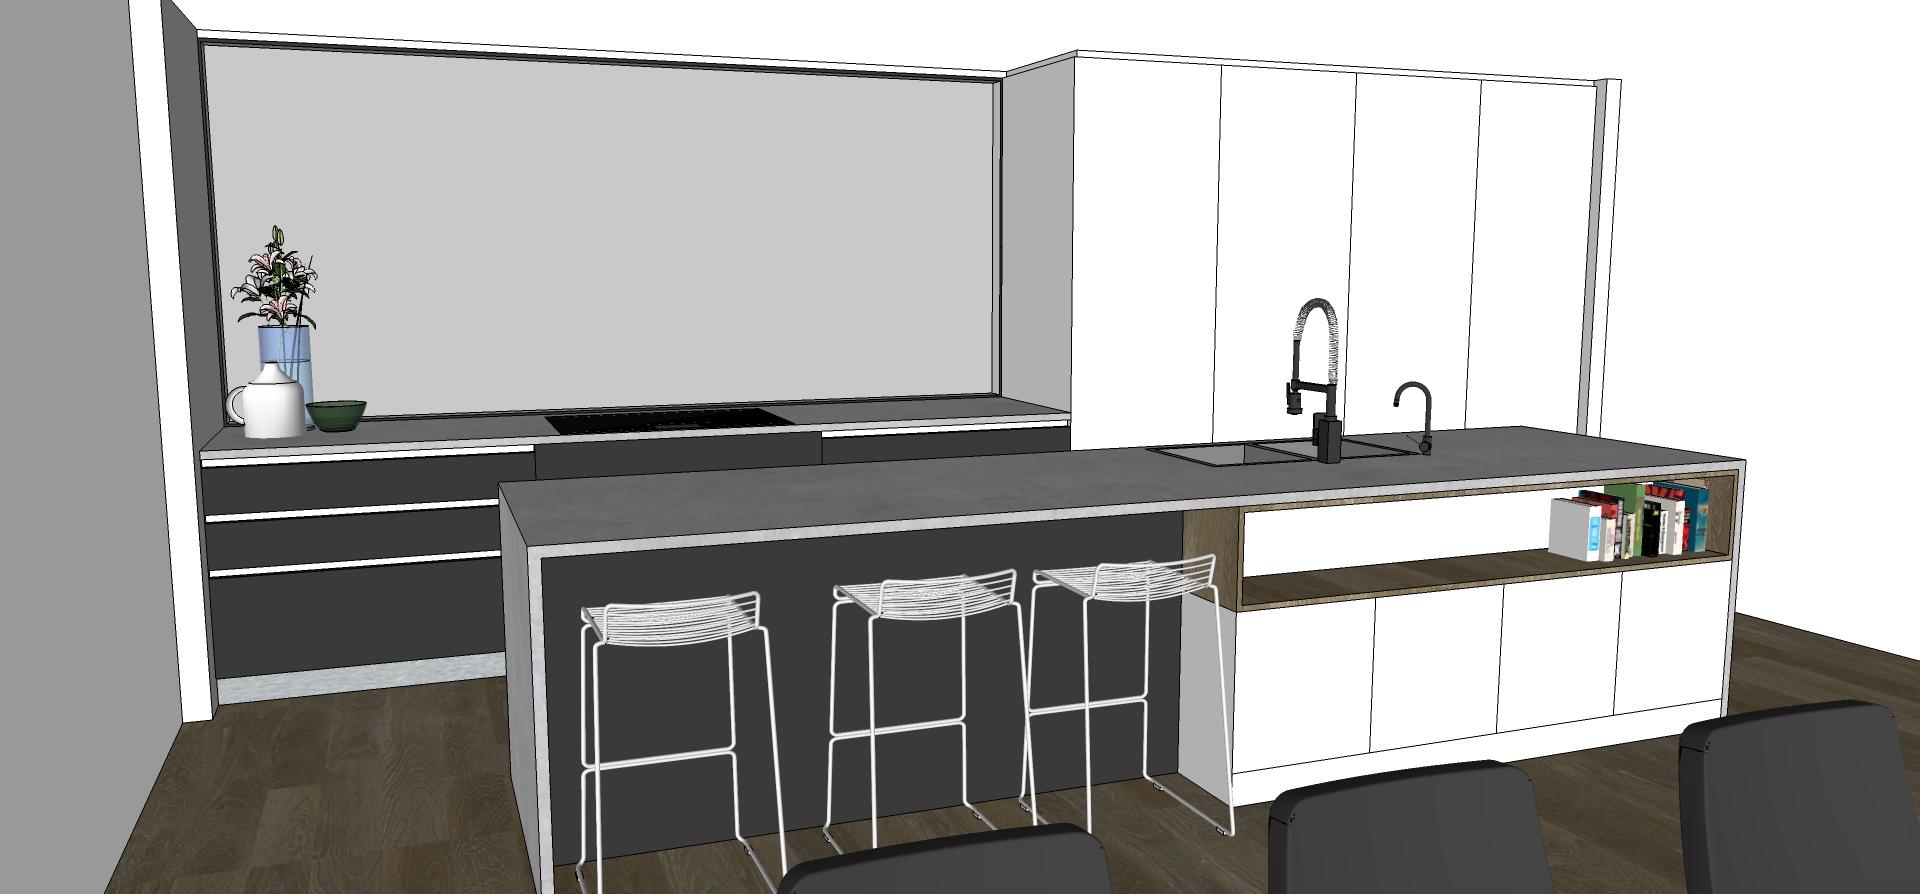 St Heliers kitchen design concept